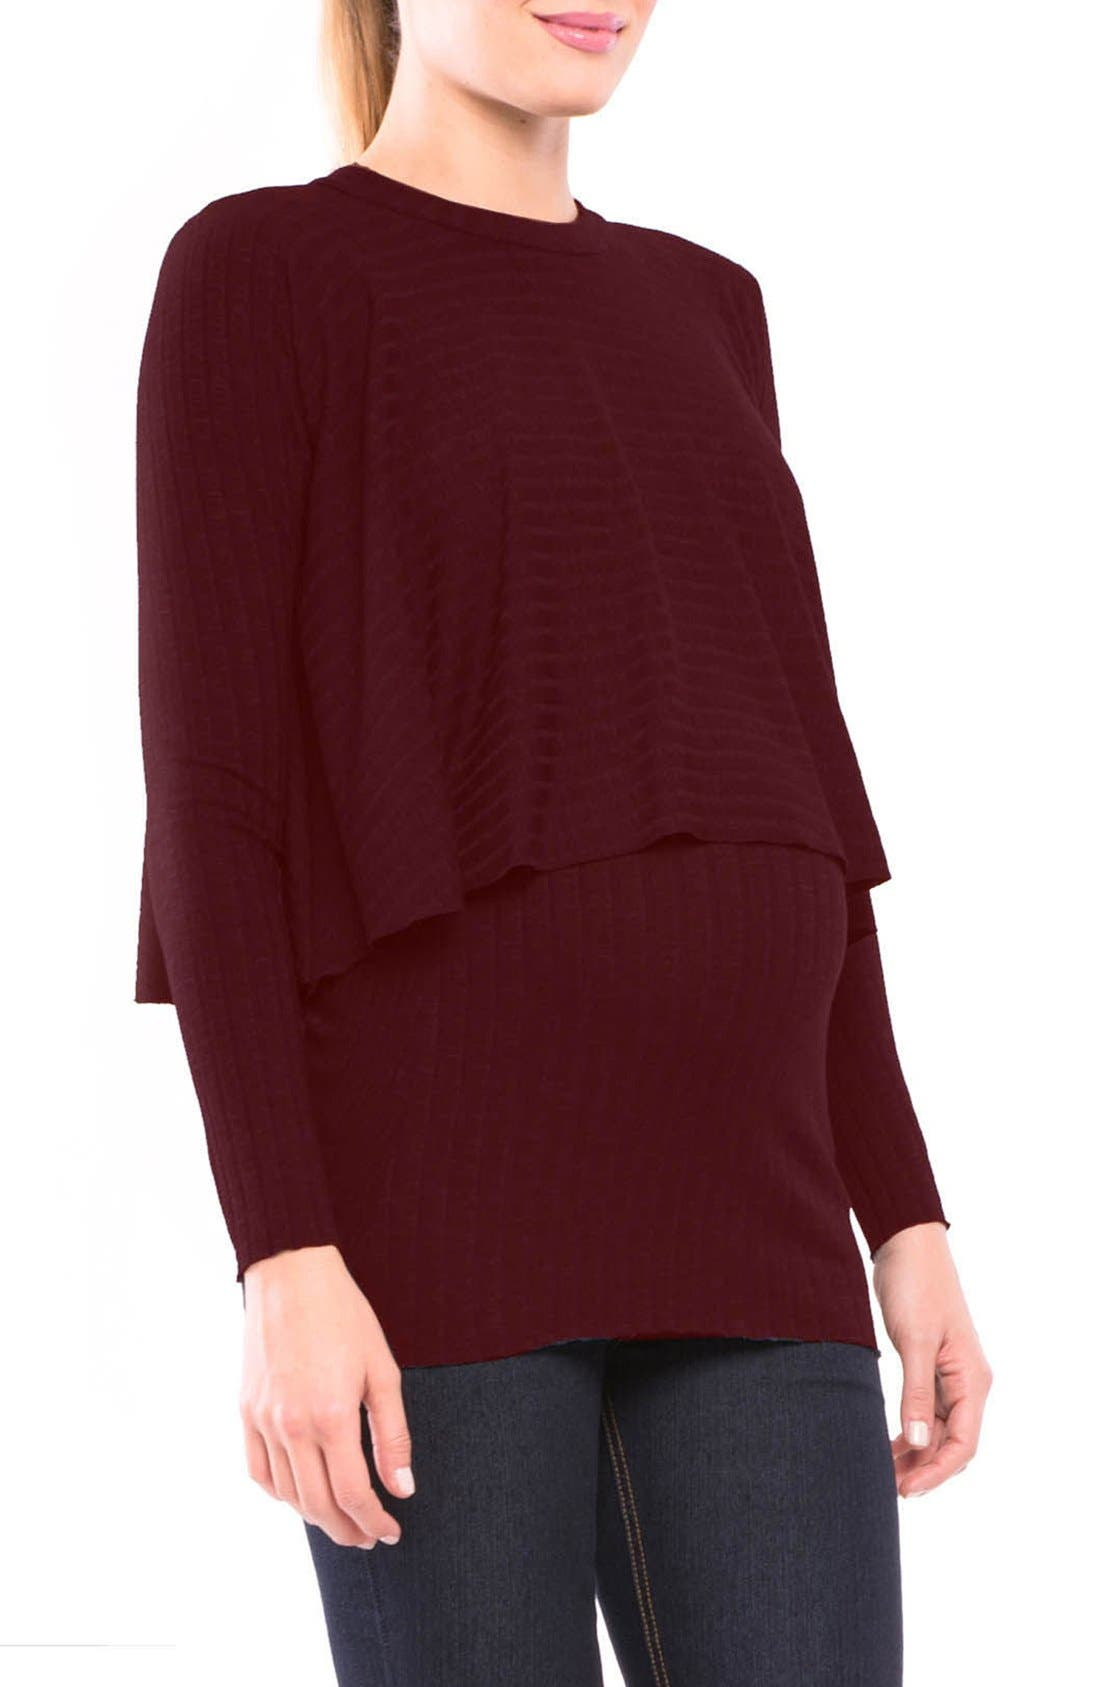 Alternate Image 1 Selected - Olian Kim Popver Maternity/Nursing Tunic Top